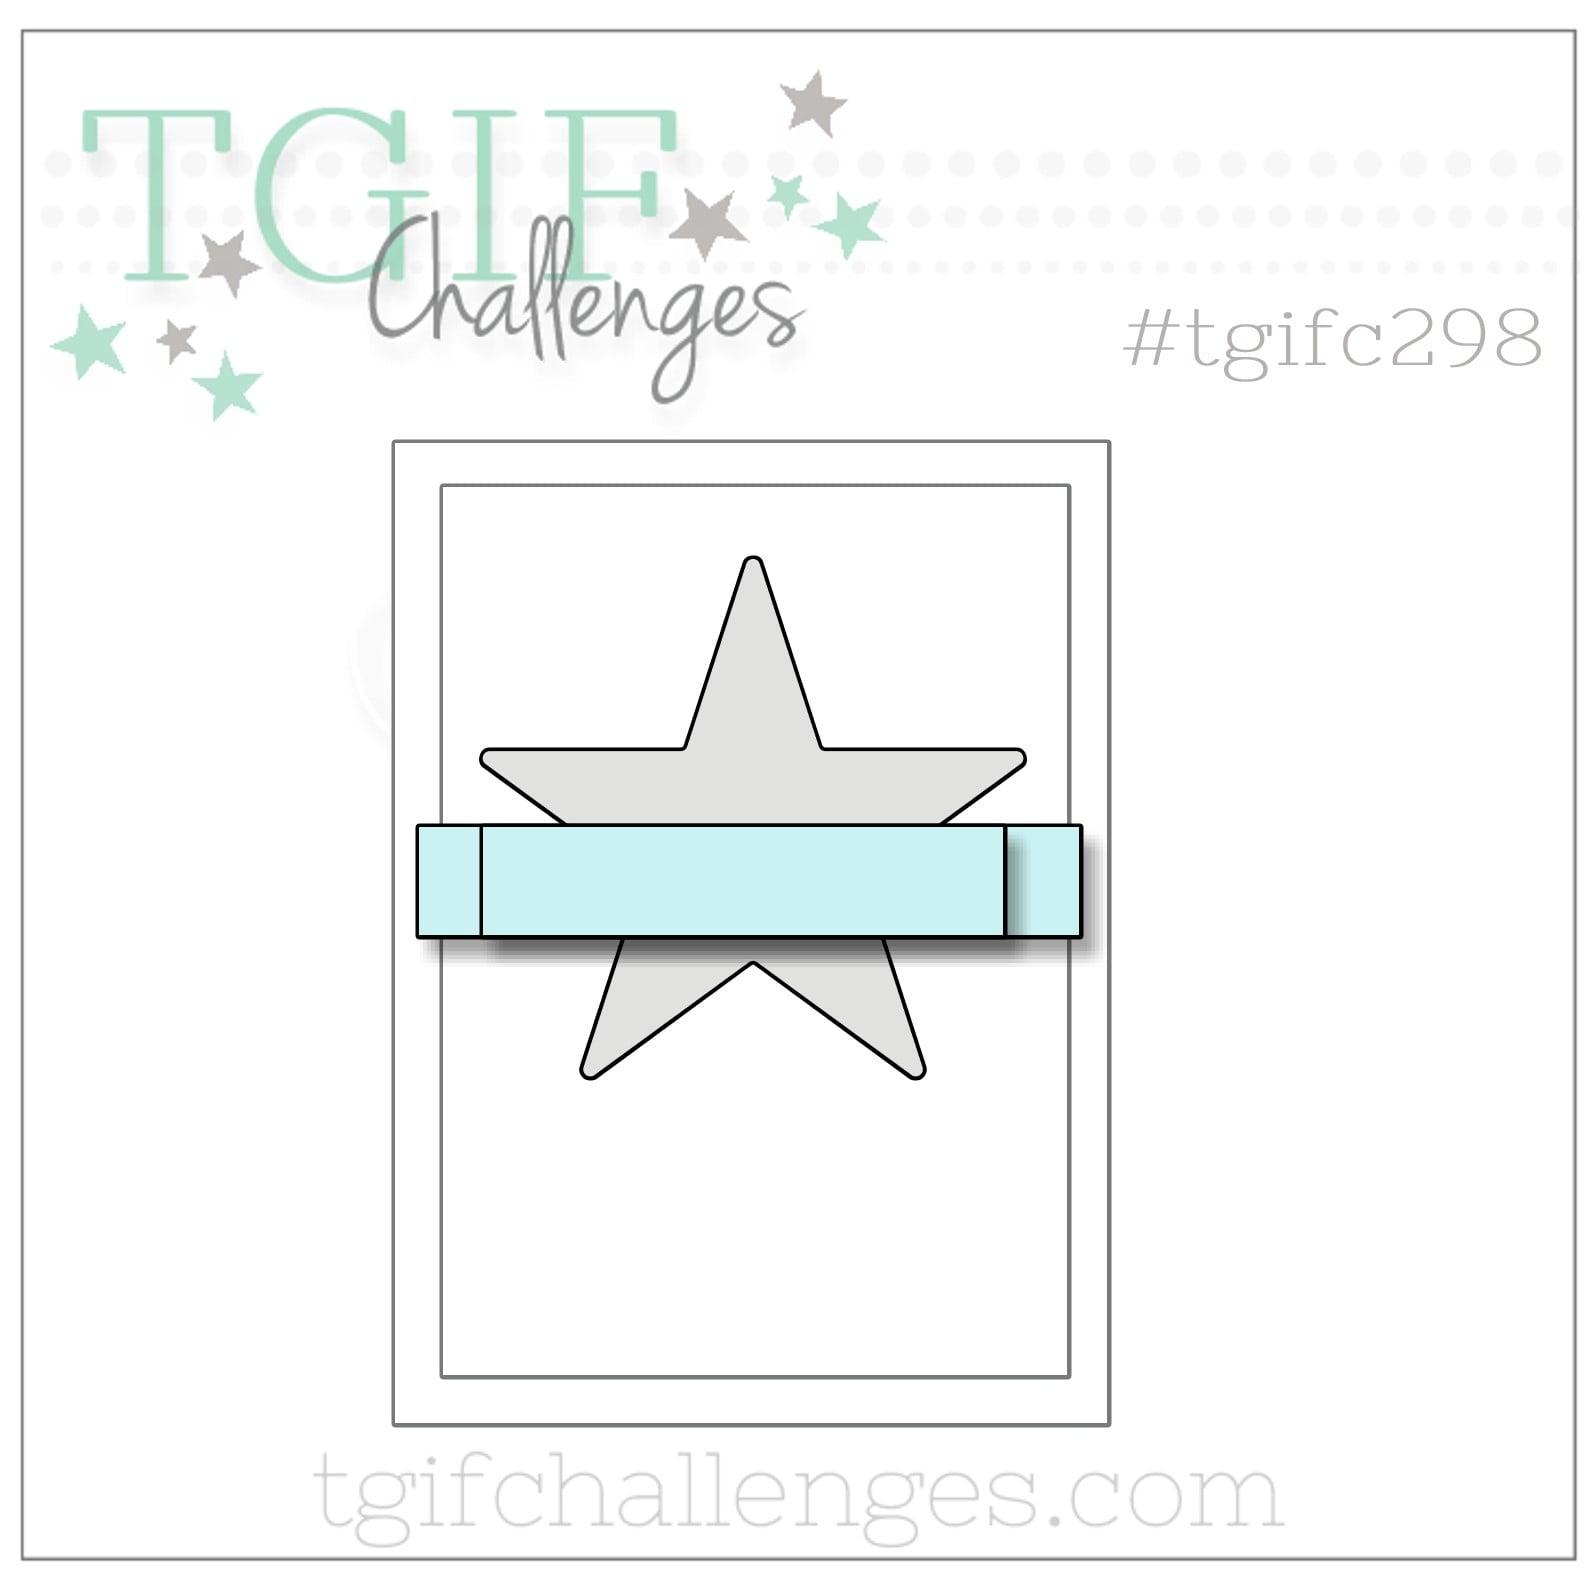 tgifc298 Sketch challenge